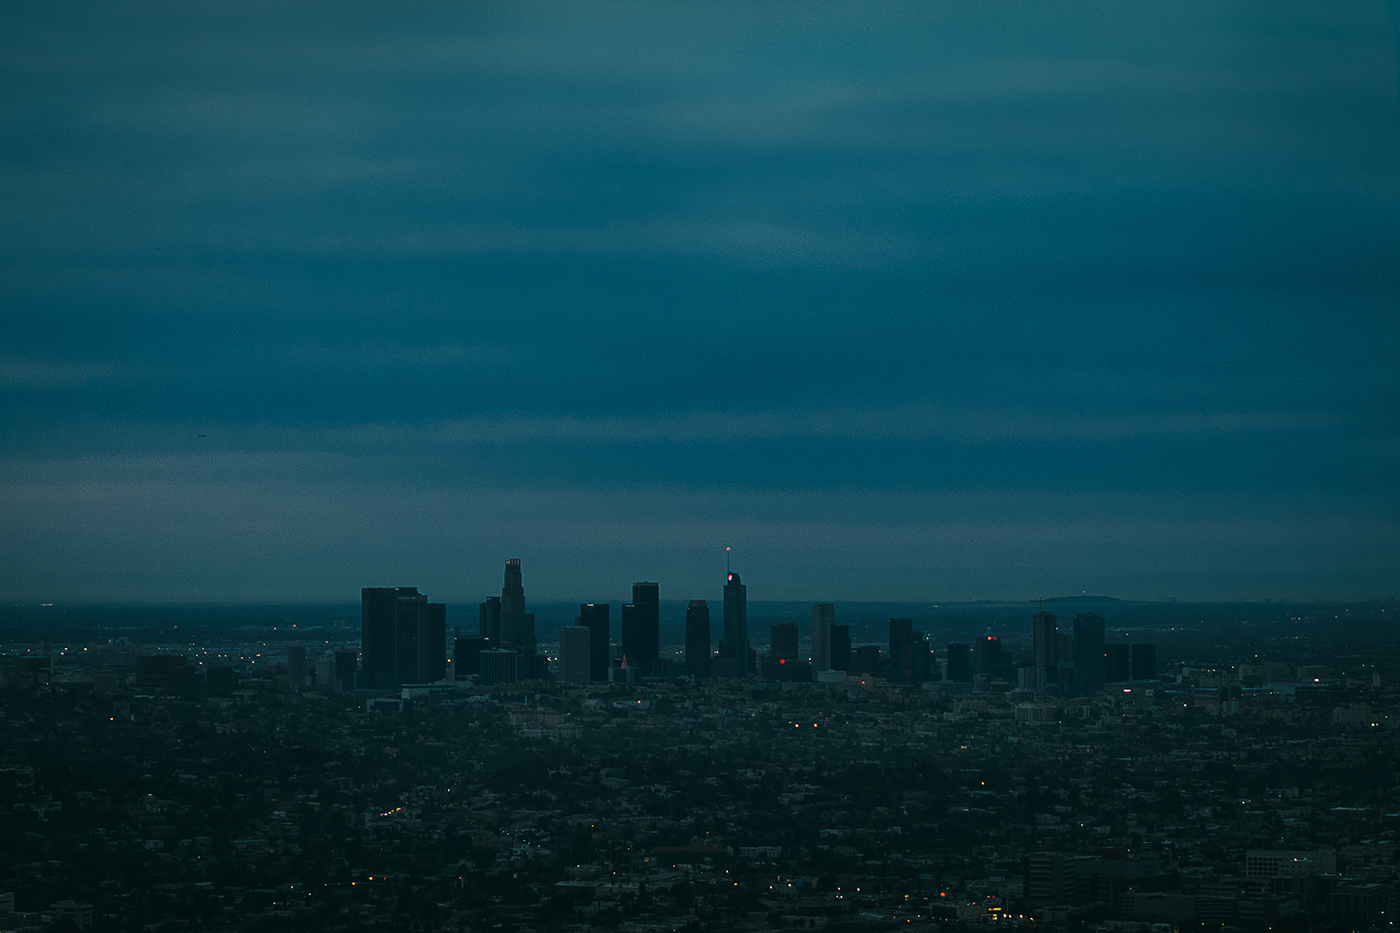 Photograph of Los Angeles Skyline